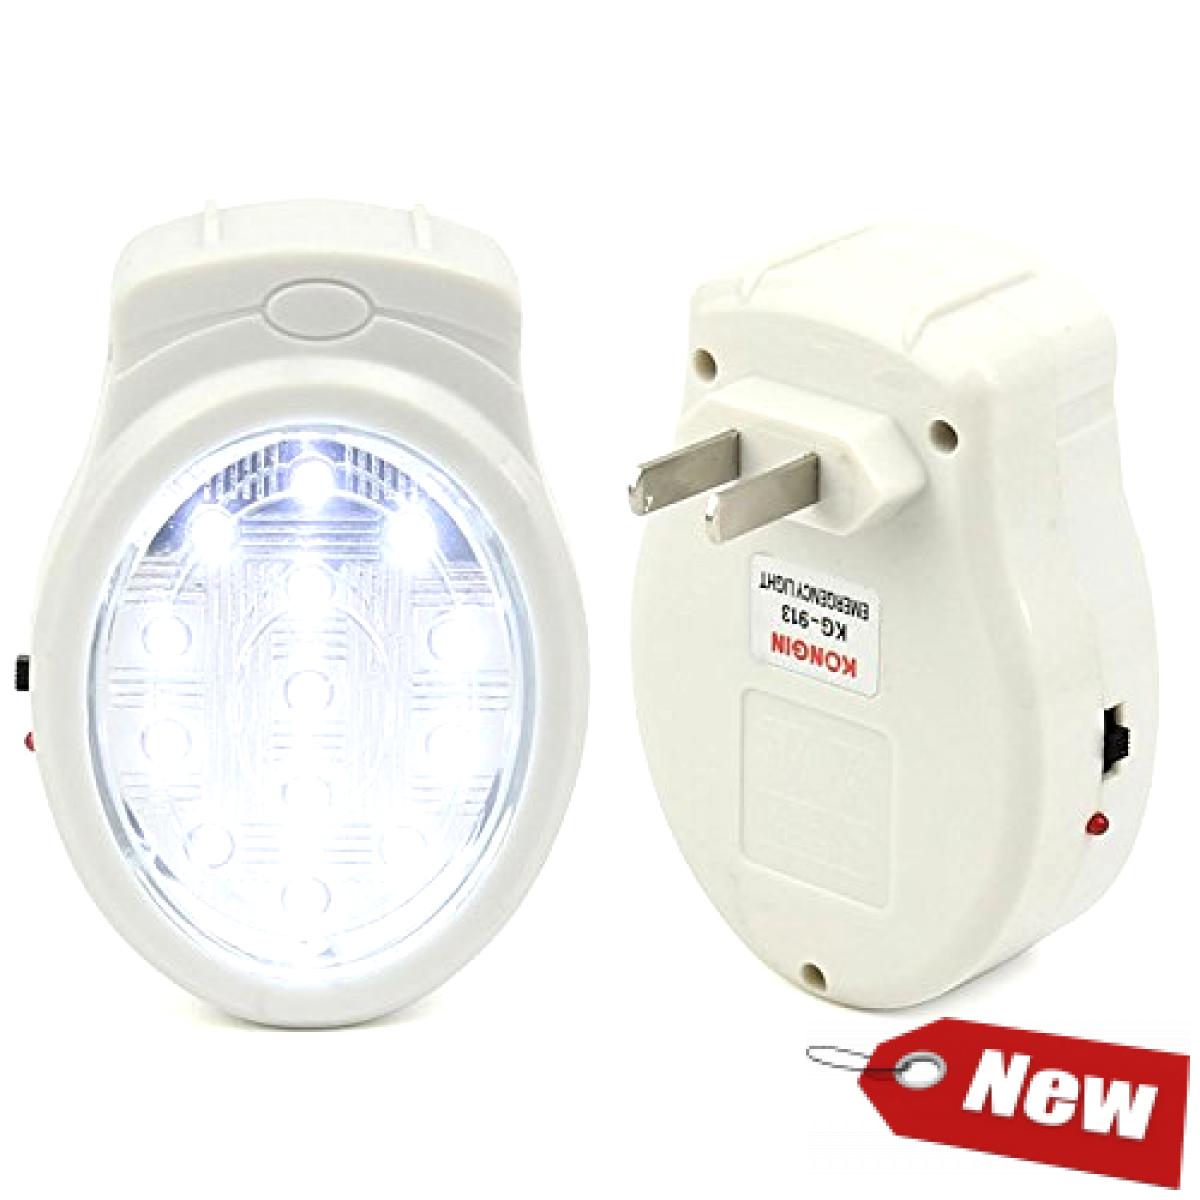 Led Rechargeable Home Emergency Automatic Power Failure Outage Light Lamp Us Eu